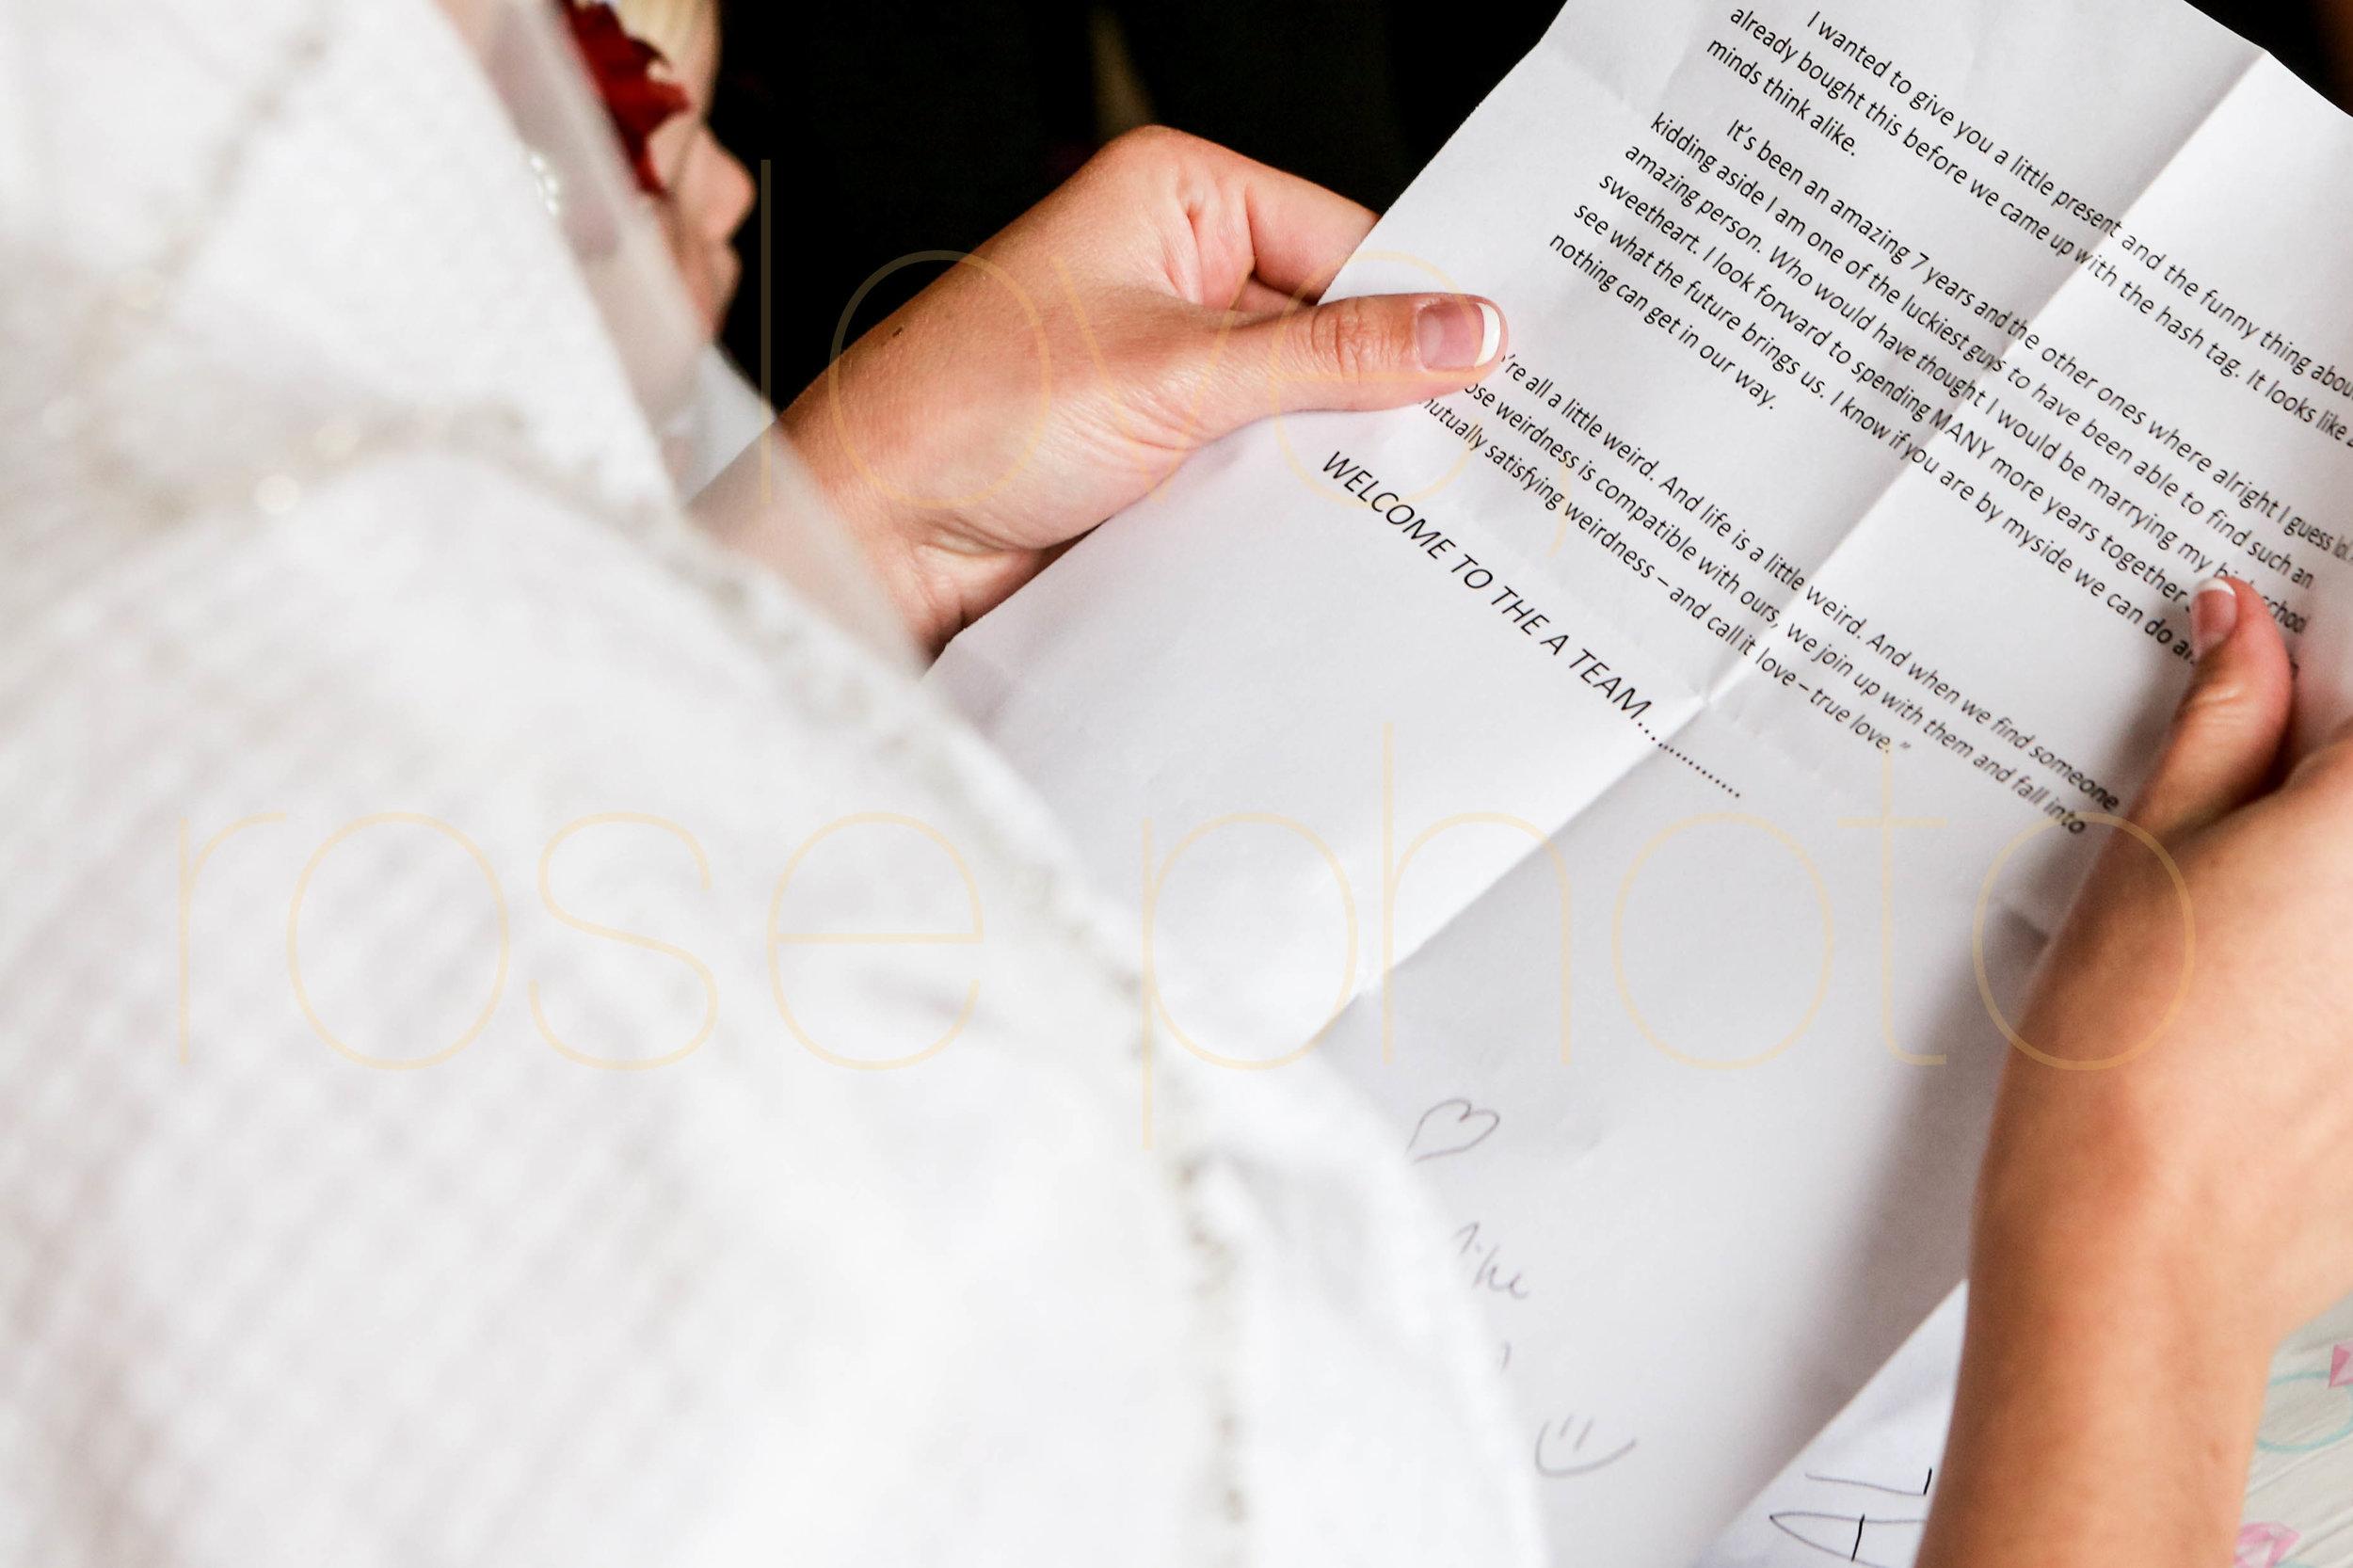 Alison + Mike Chicago Wedding Photographer Blog -39.jpg